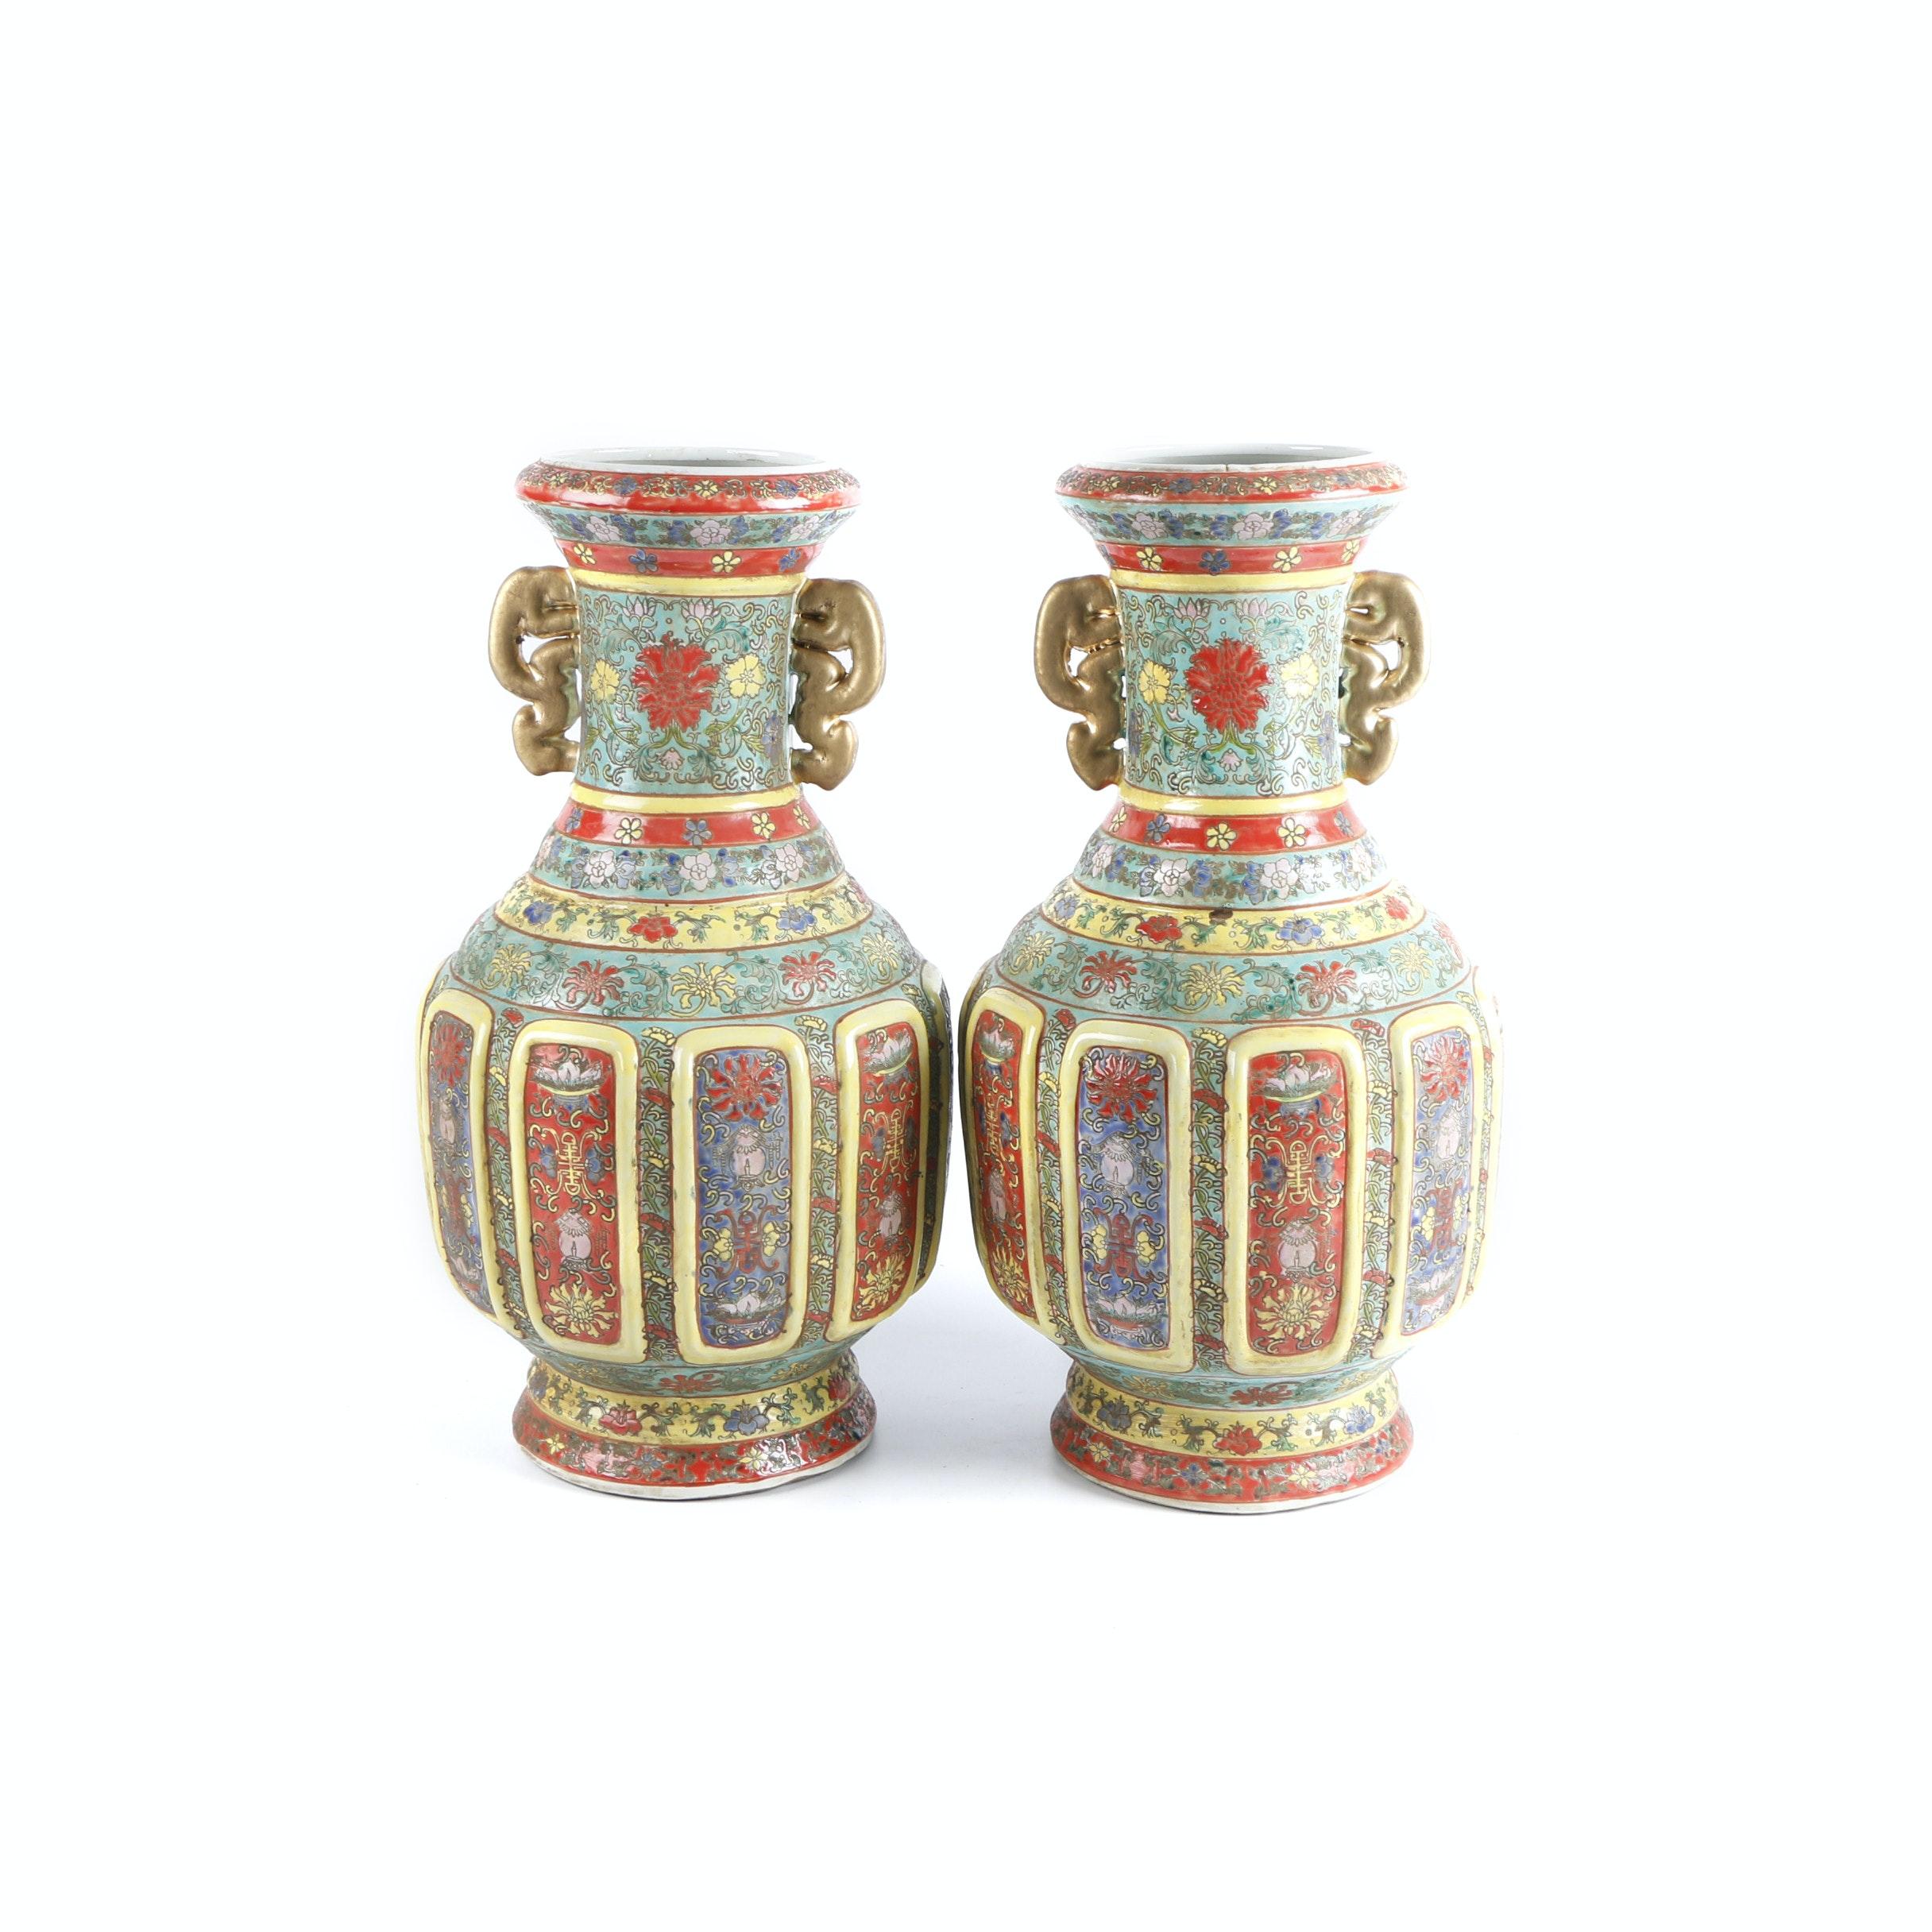 Hand-Painted Chinese Ceramic Vases